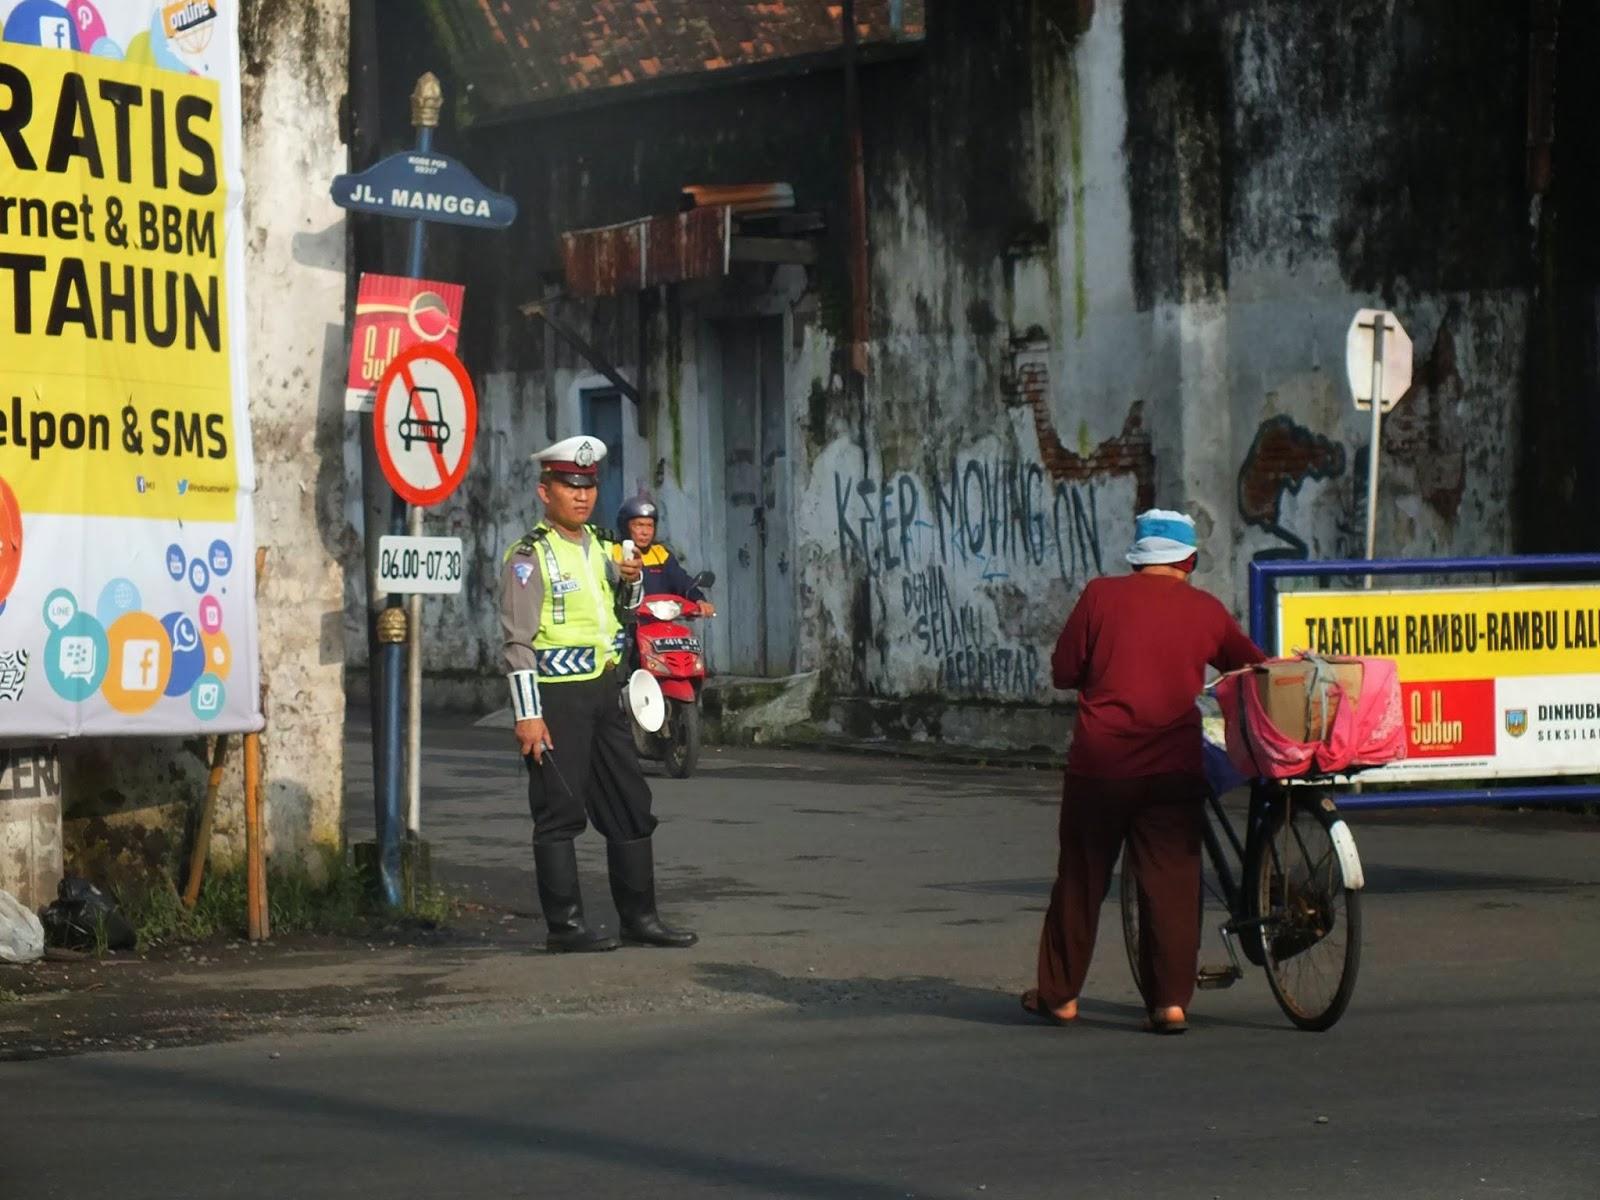 Jalan Mangga Tertutup Bagi Roda Empat